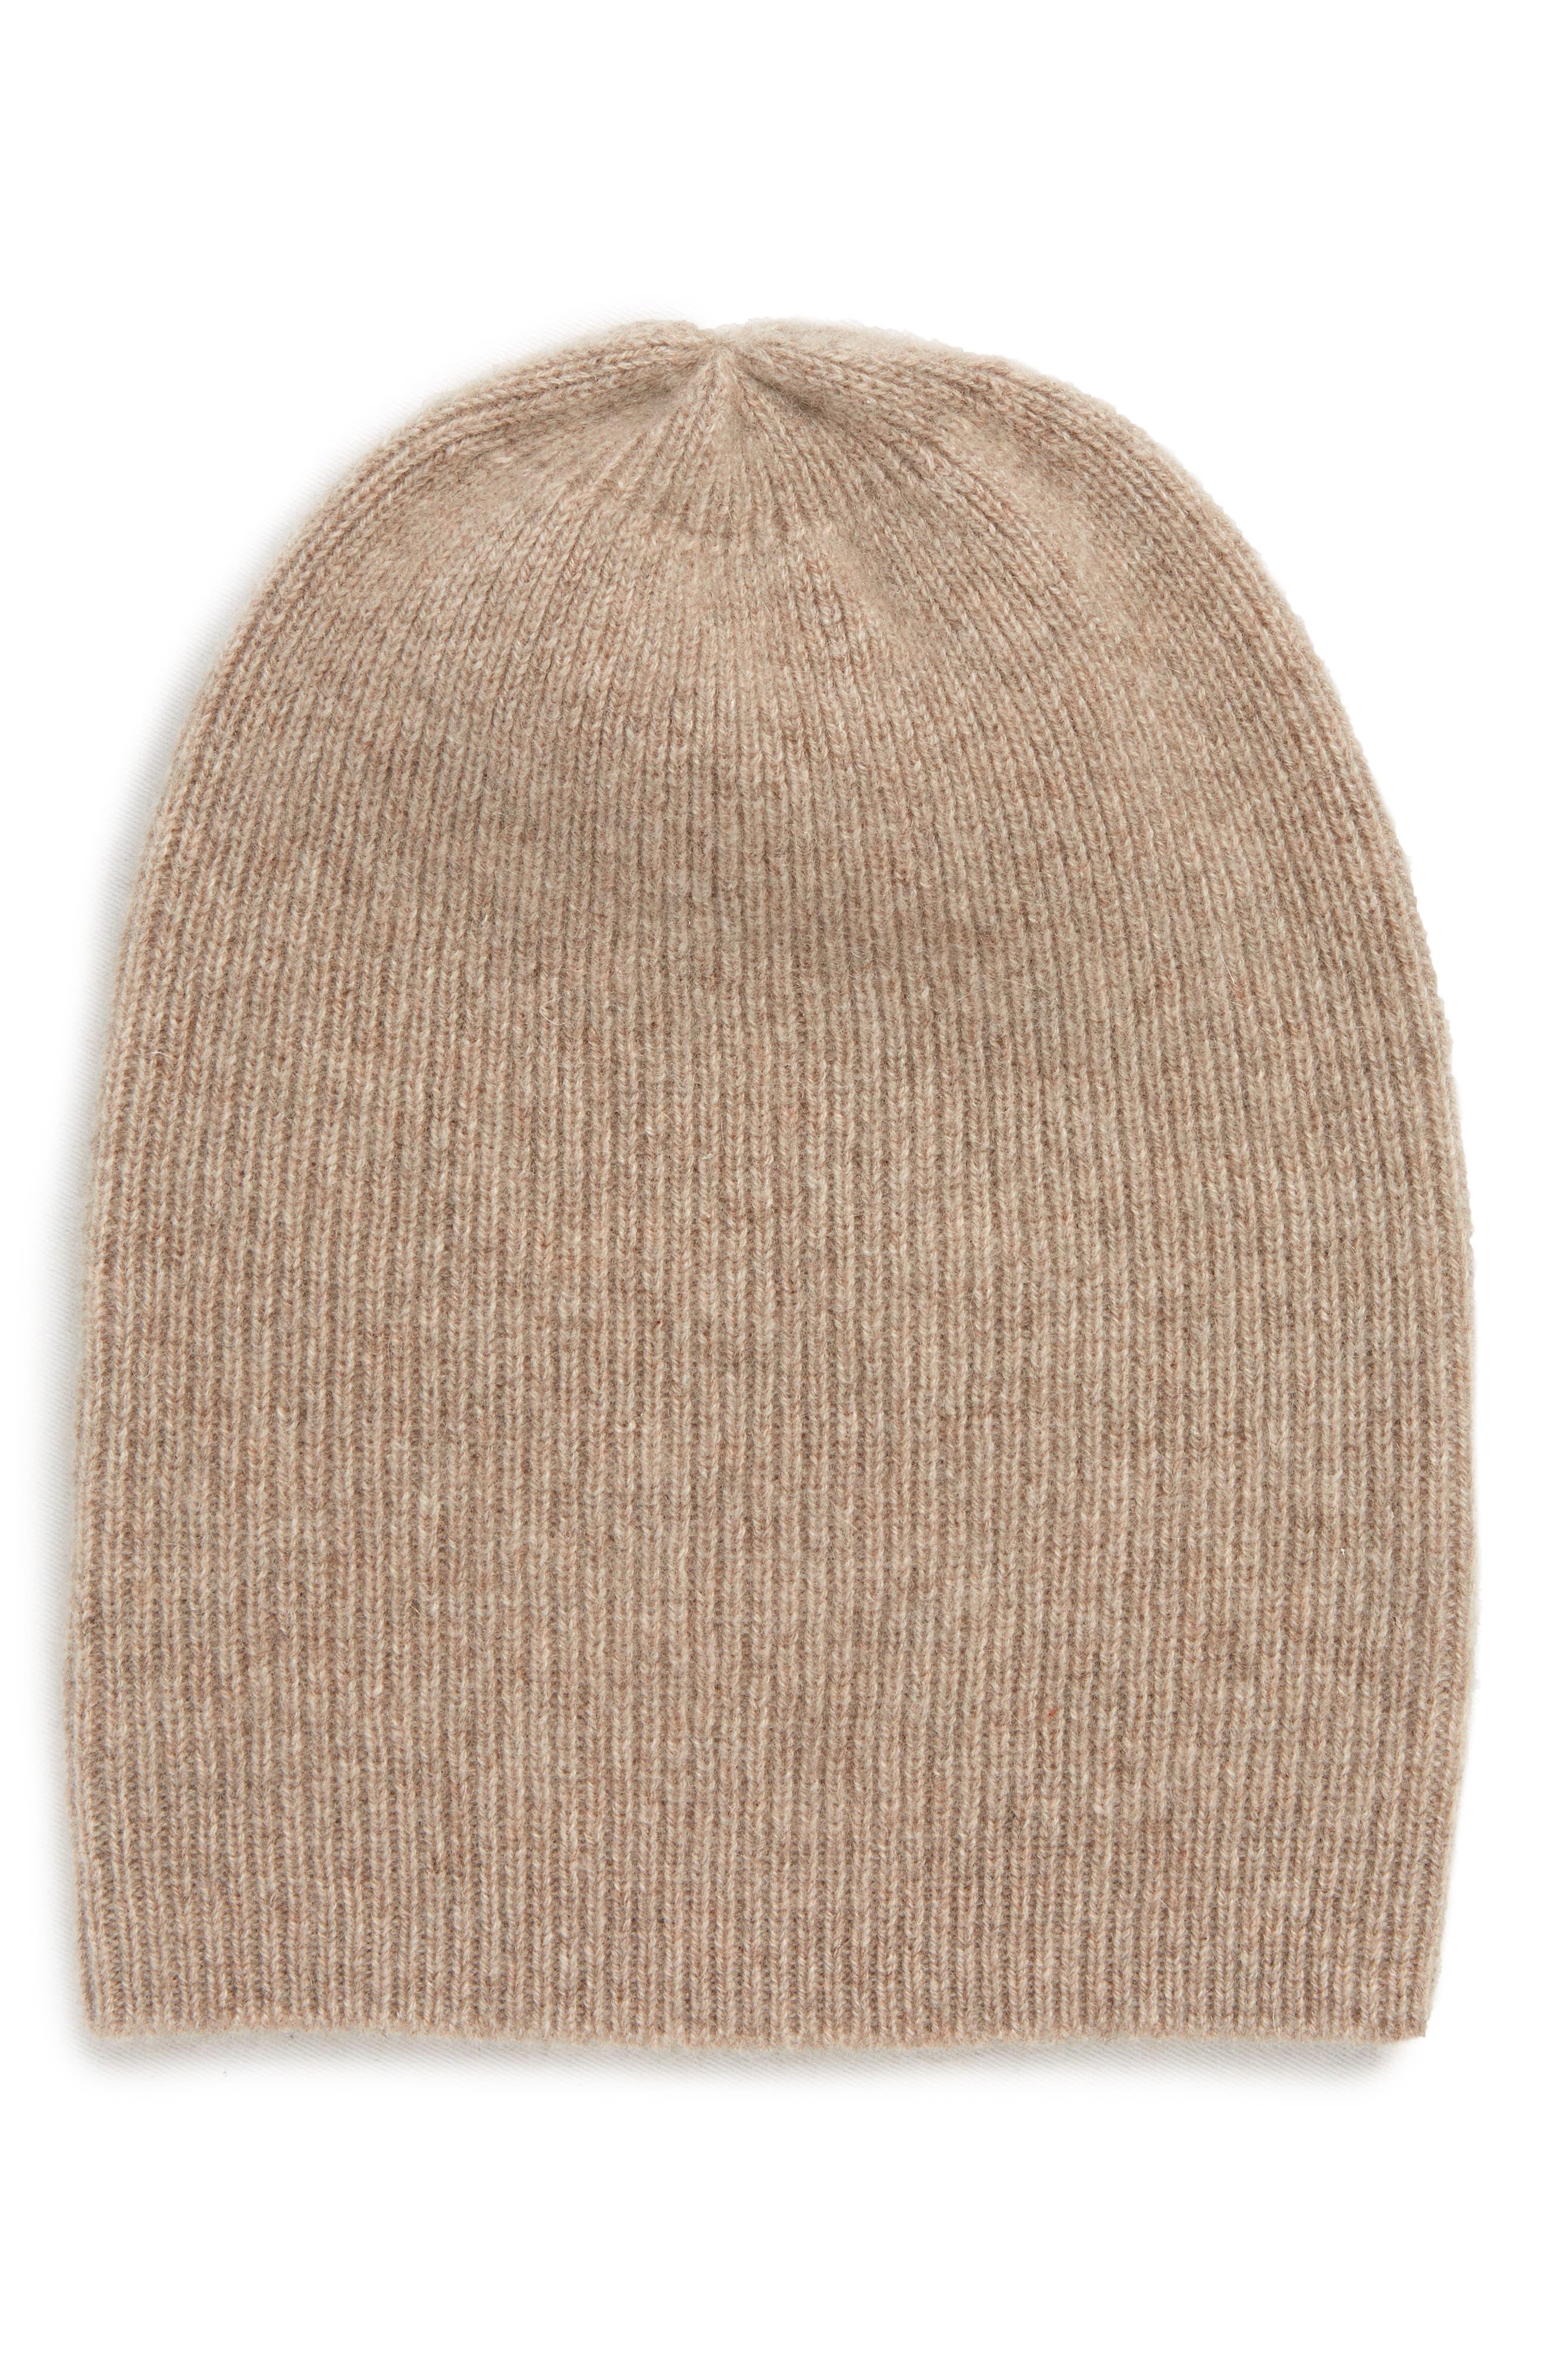 44c59a8447f Women s Grey Winter Accessories